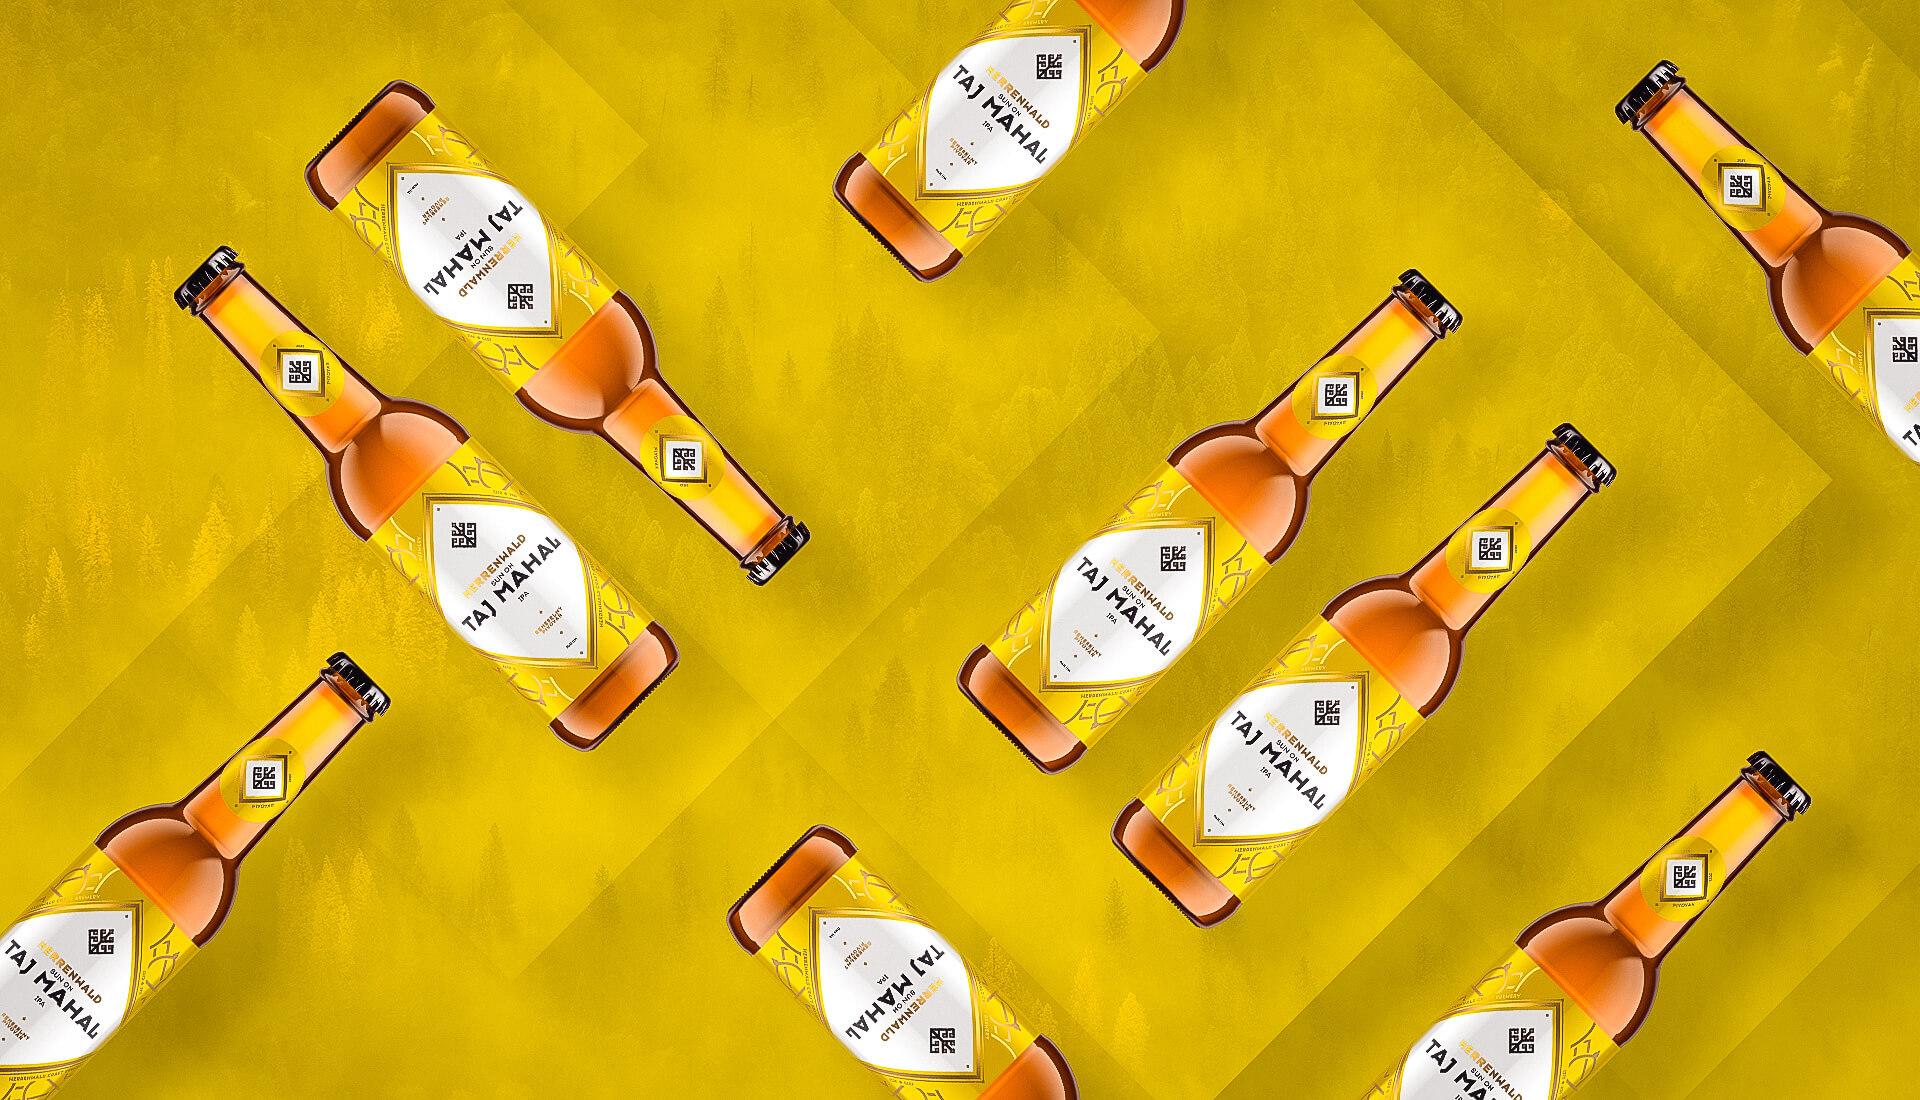 Beer label packaging design TAJ MAHAL -HERRENWALD craft brewery 0.33L